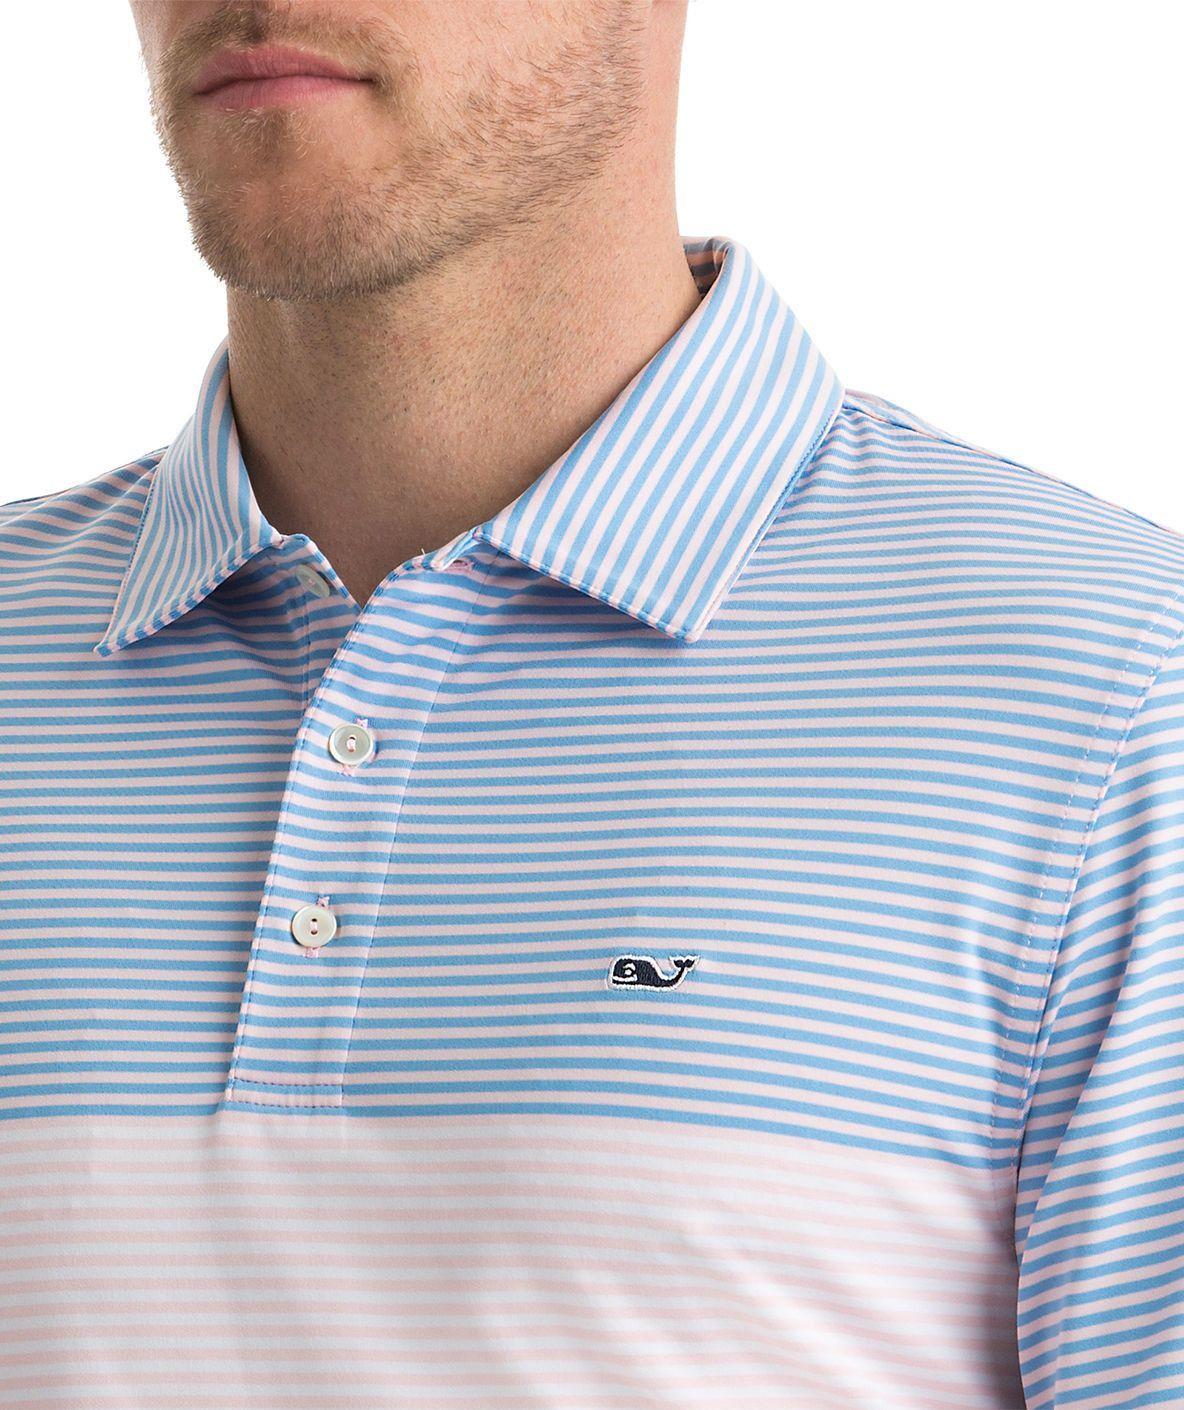 Men's Vineyard Vines Newport Stripe Polo